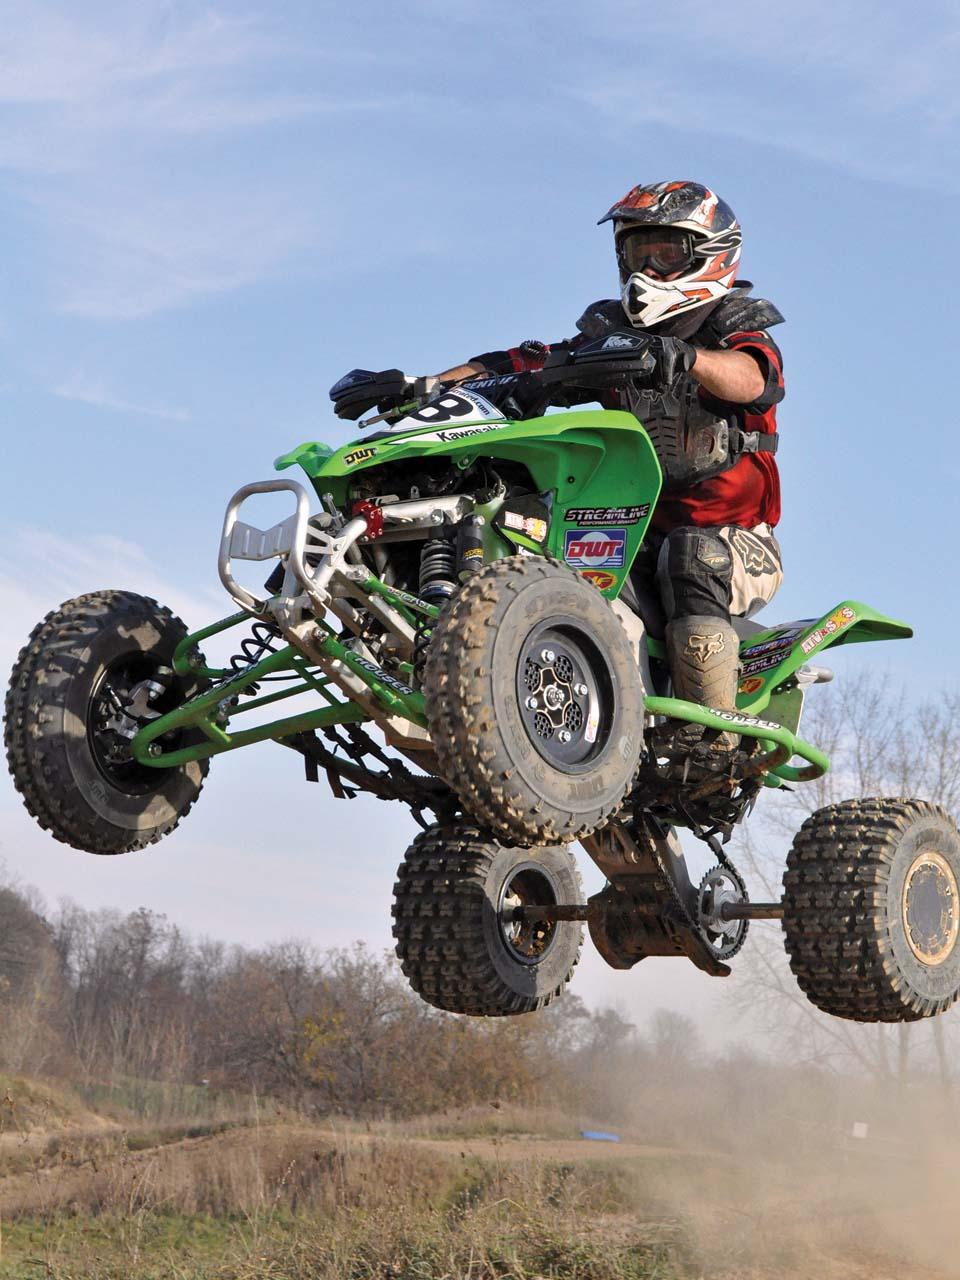 Project Quad - 2011 KFX450R, Part II | ATV Illustrated